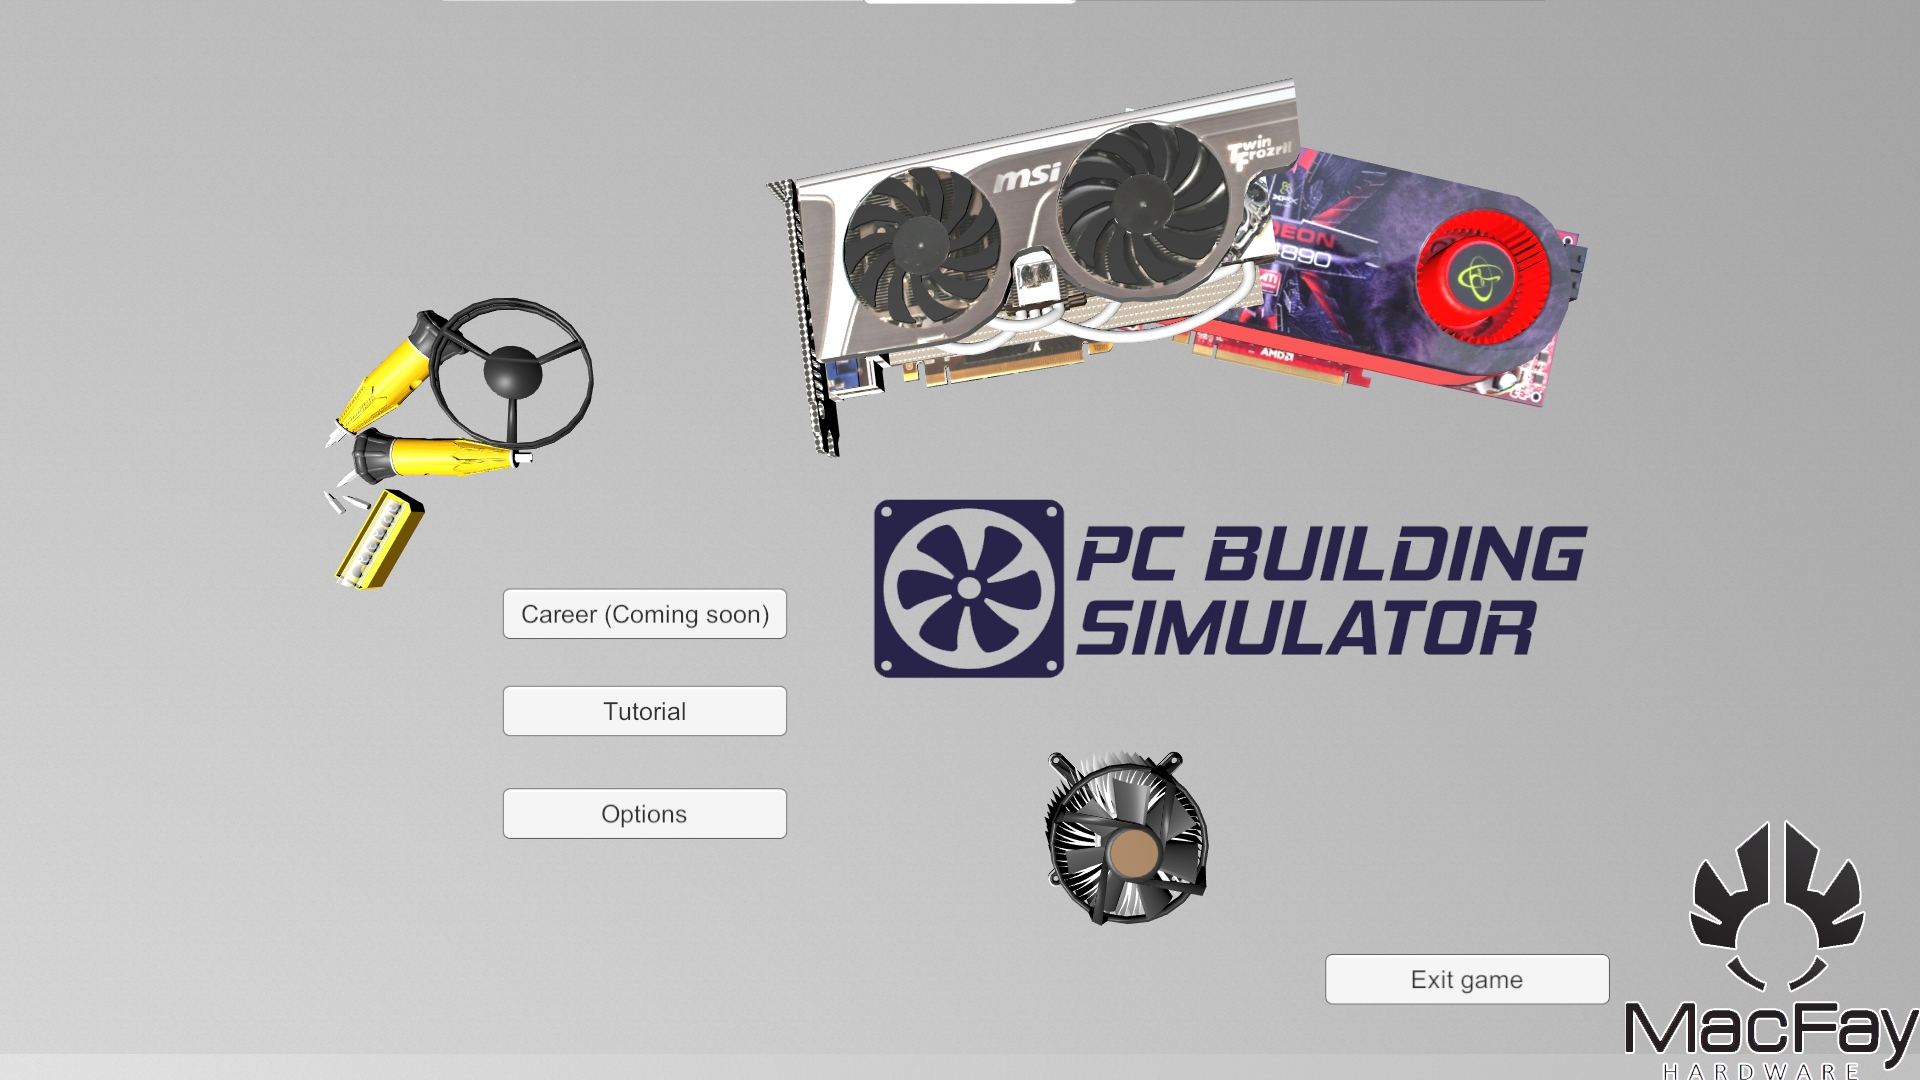 PC Building Simulator - menu